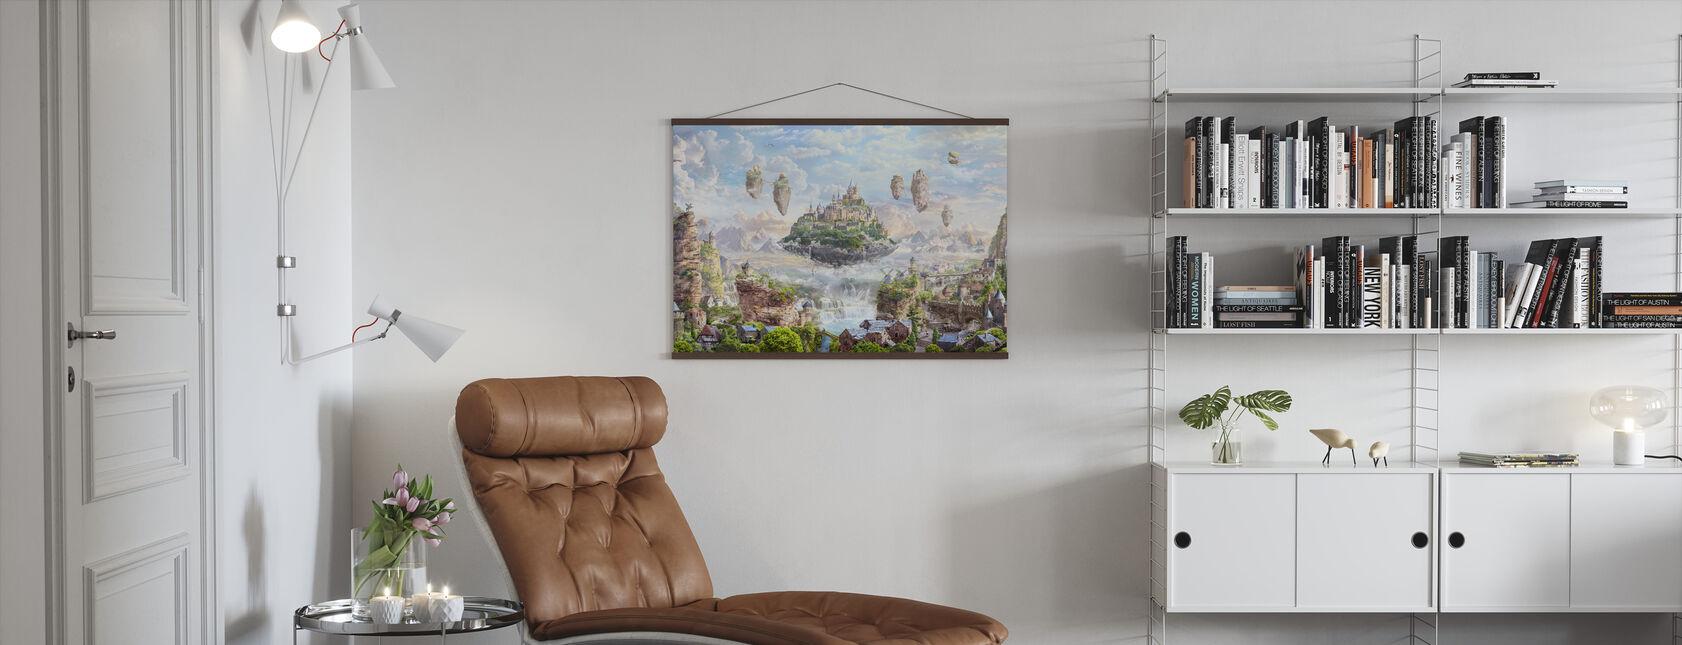 Sky Castle - Poster - Living Room